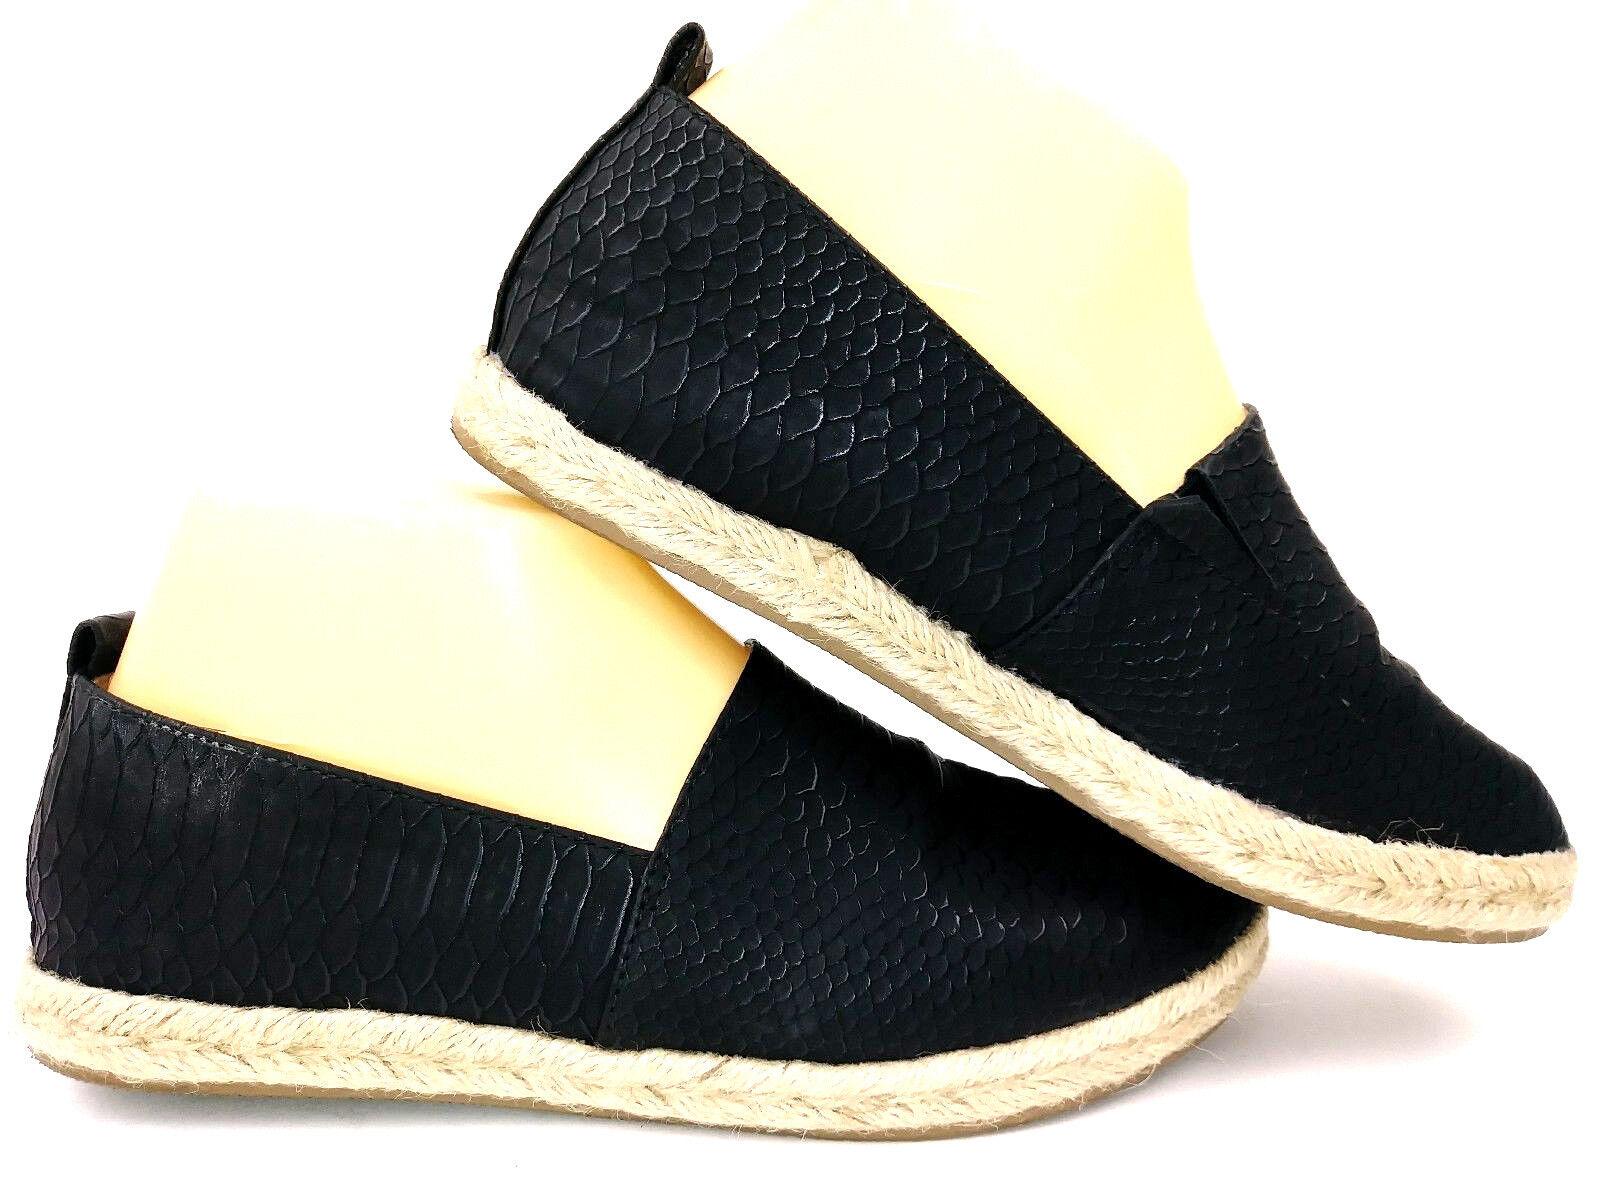 Brash Womens Espadrille Flats Size 7 Black Slip On Shoes